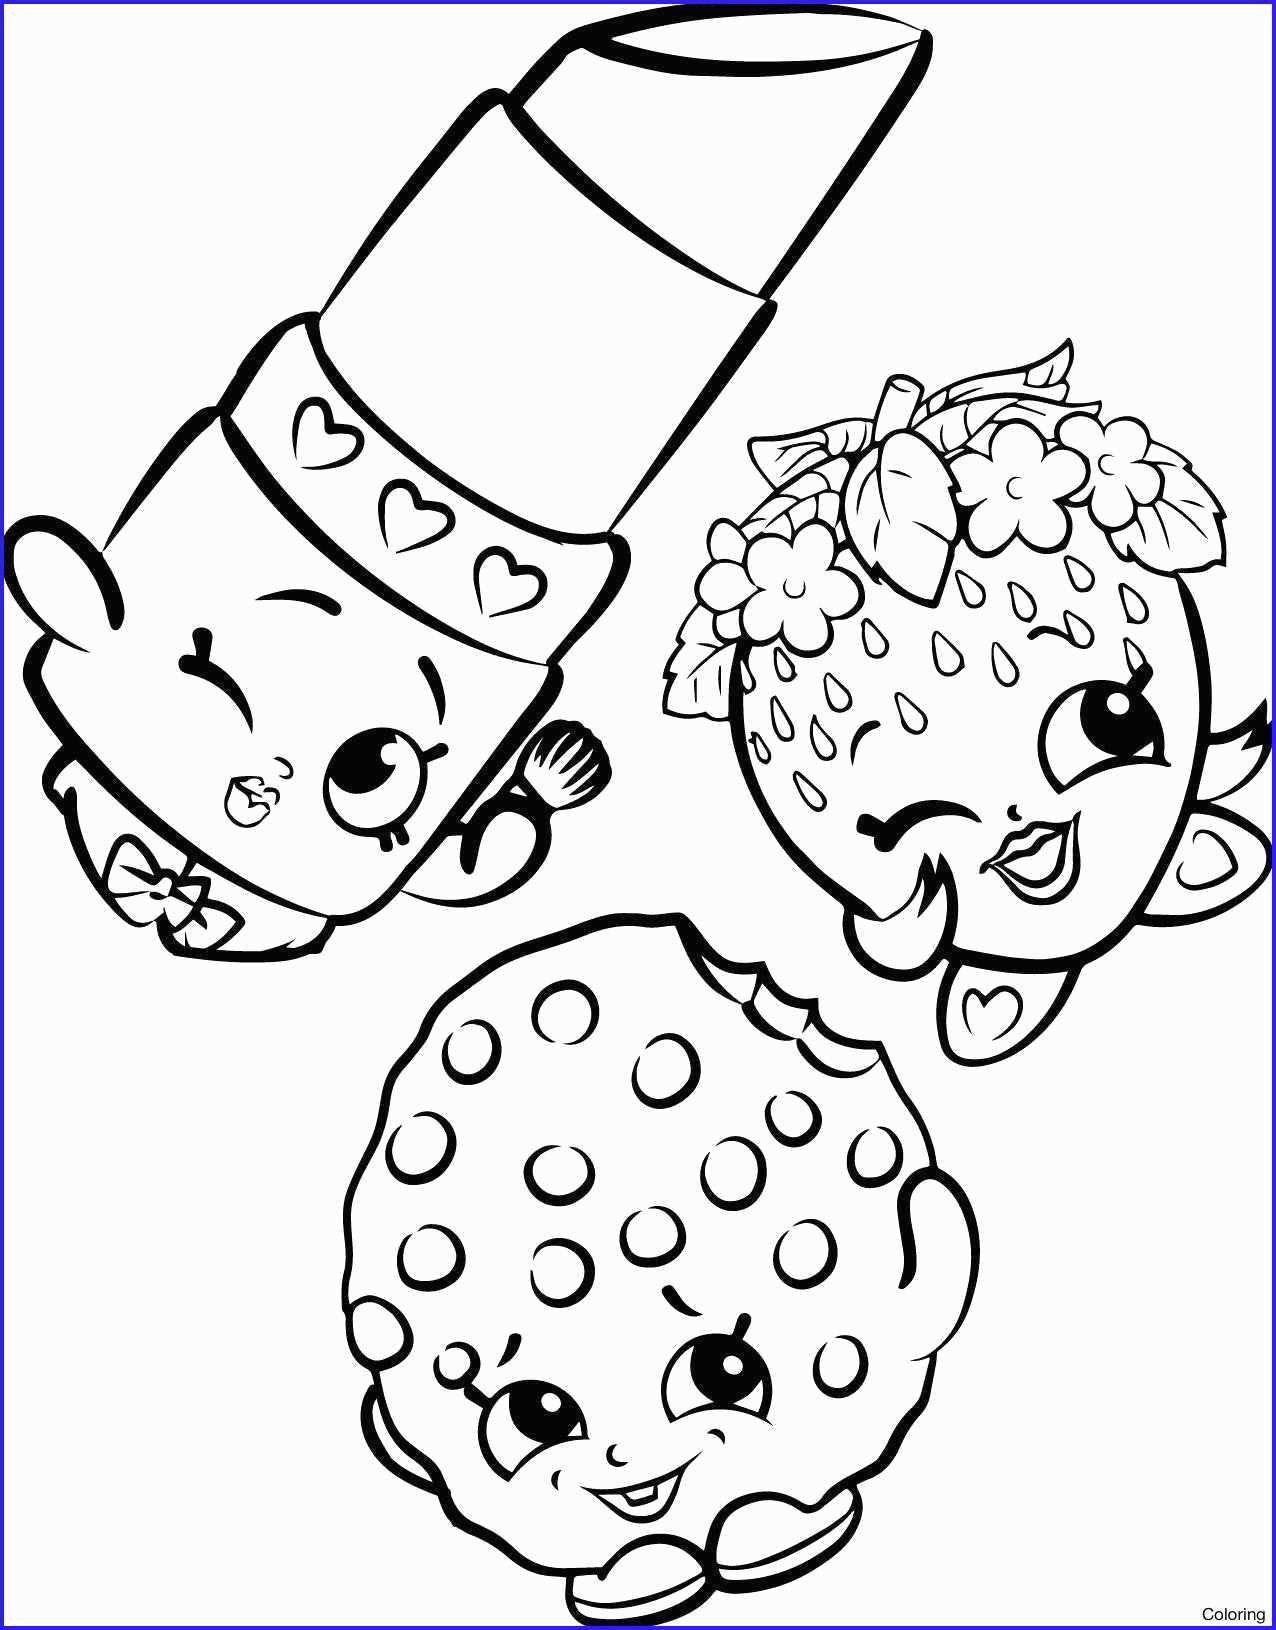 Num Noms Coloring Pages Elegant Coloring Pages Num Noms Kolorowanki Ala In 2020 Shopkin Coloring Pages Shopkins Coloring Pages Free Printable Shopkins Colouring Pages